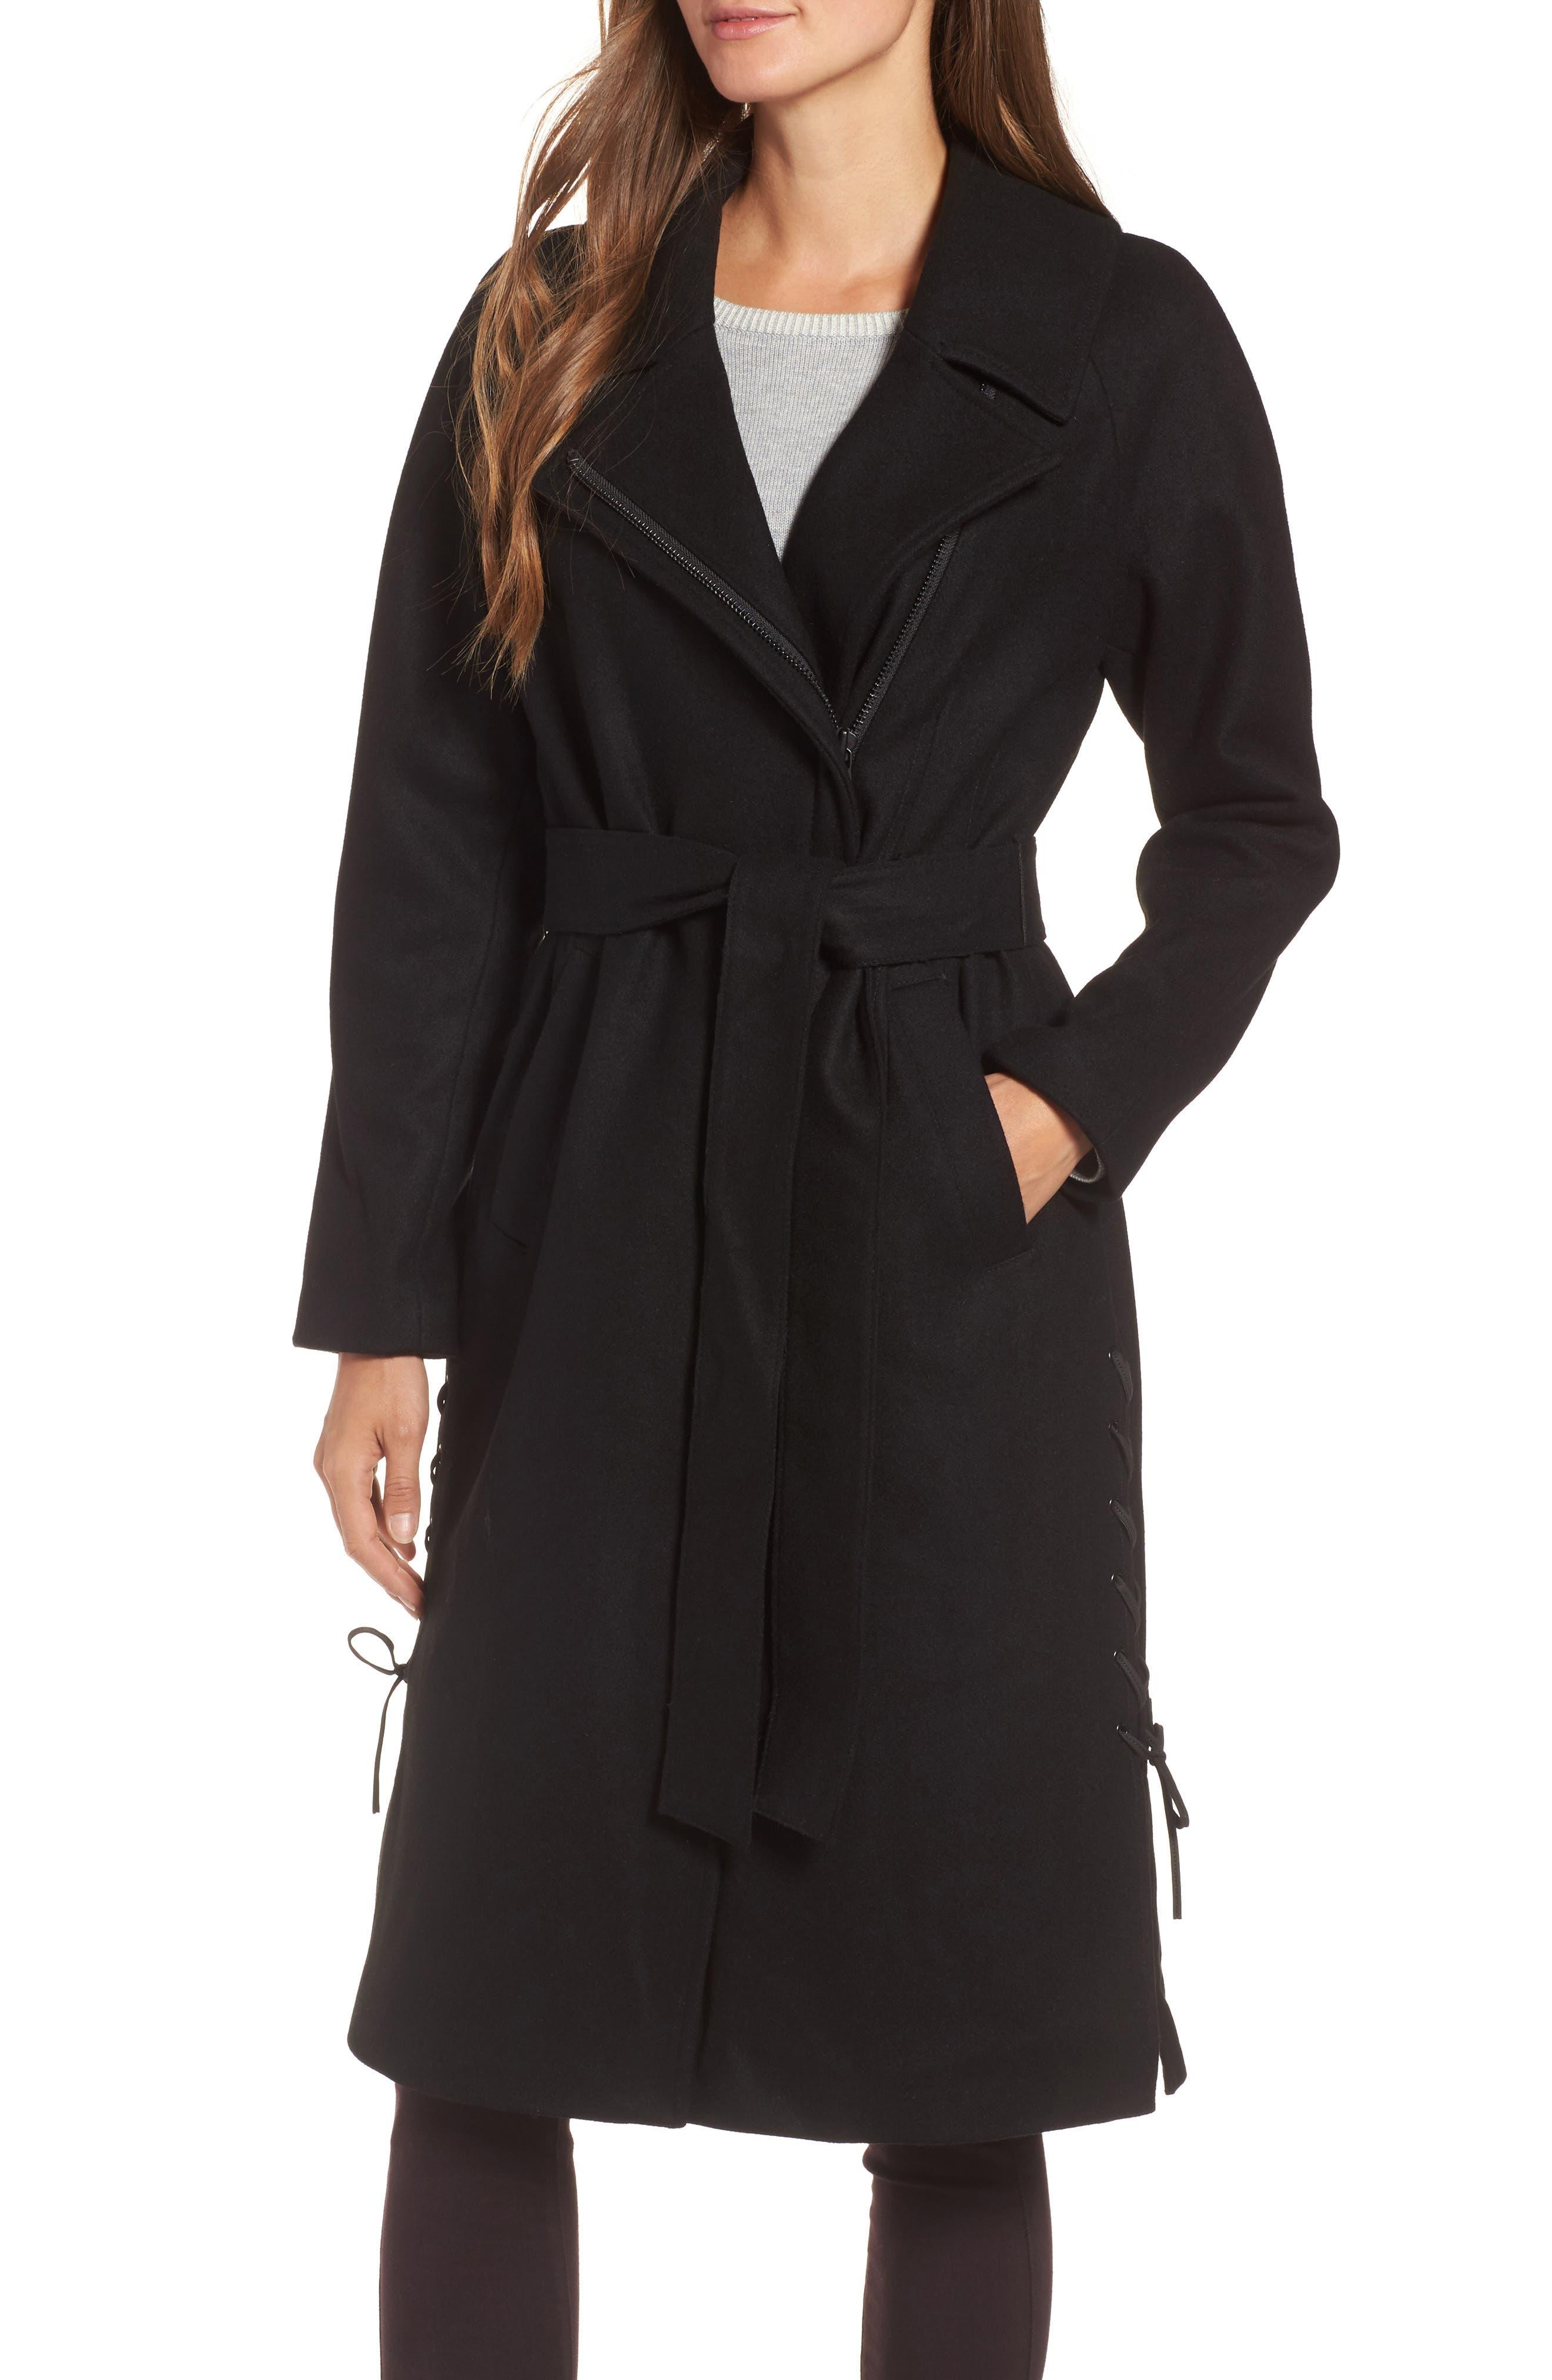 Alternate Image 1 Selected - Andrew Marc Baylee Asymmetrical Wool Blend Coat